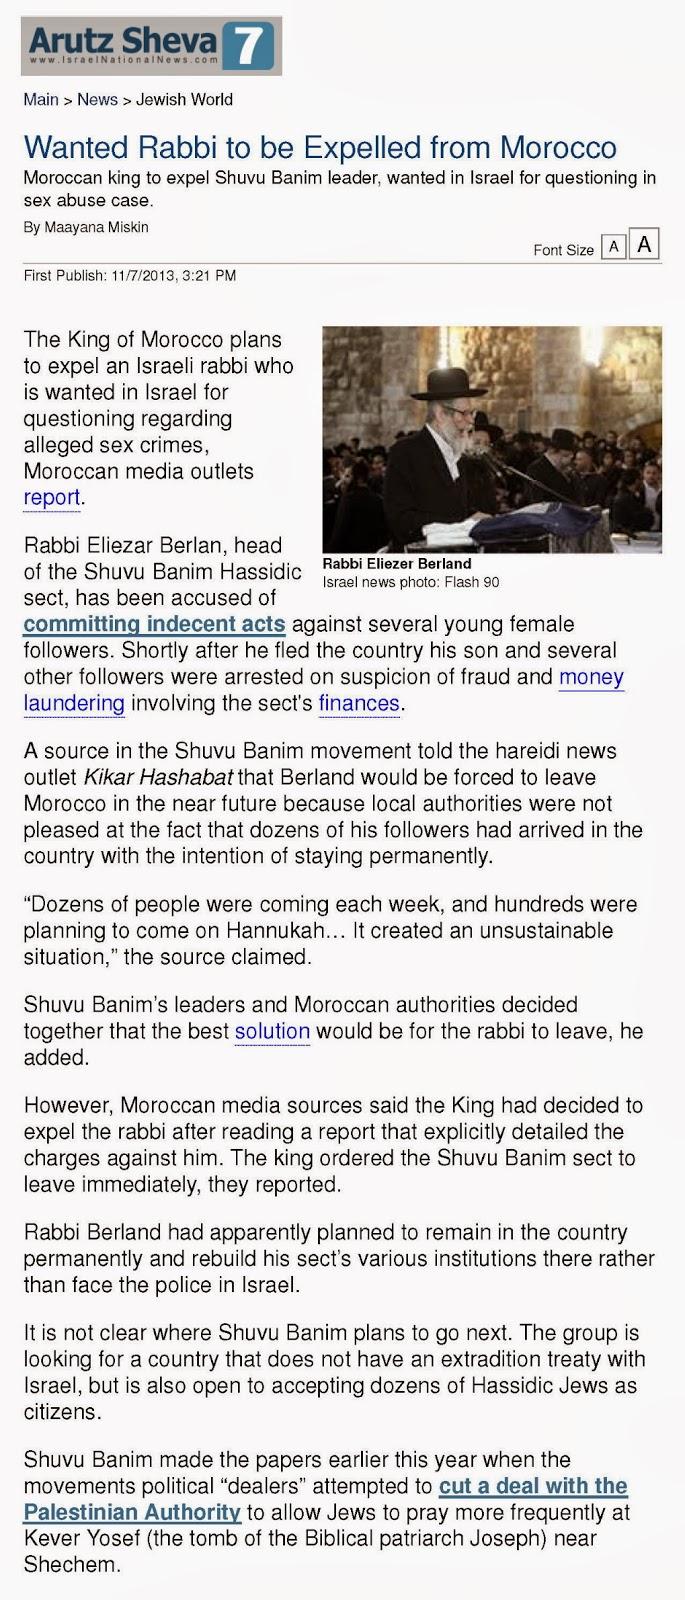 http://www.israelnationalnews.com/News/News.aspx/173735#.Unv_AOIpovQ